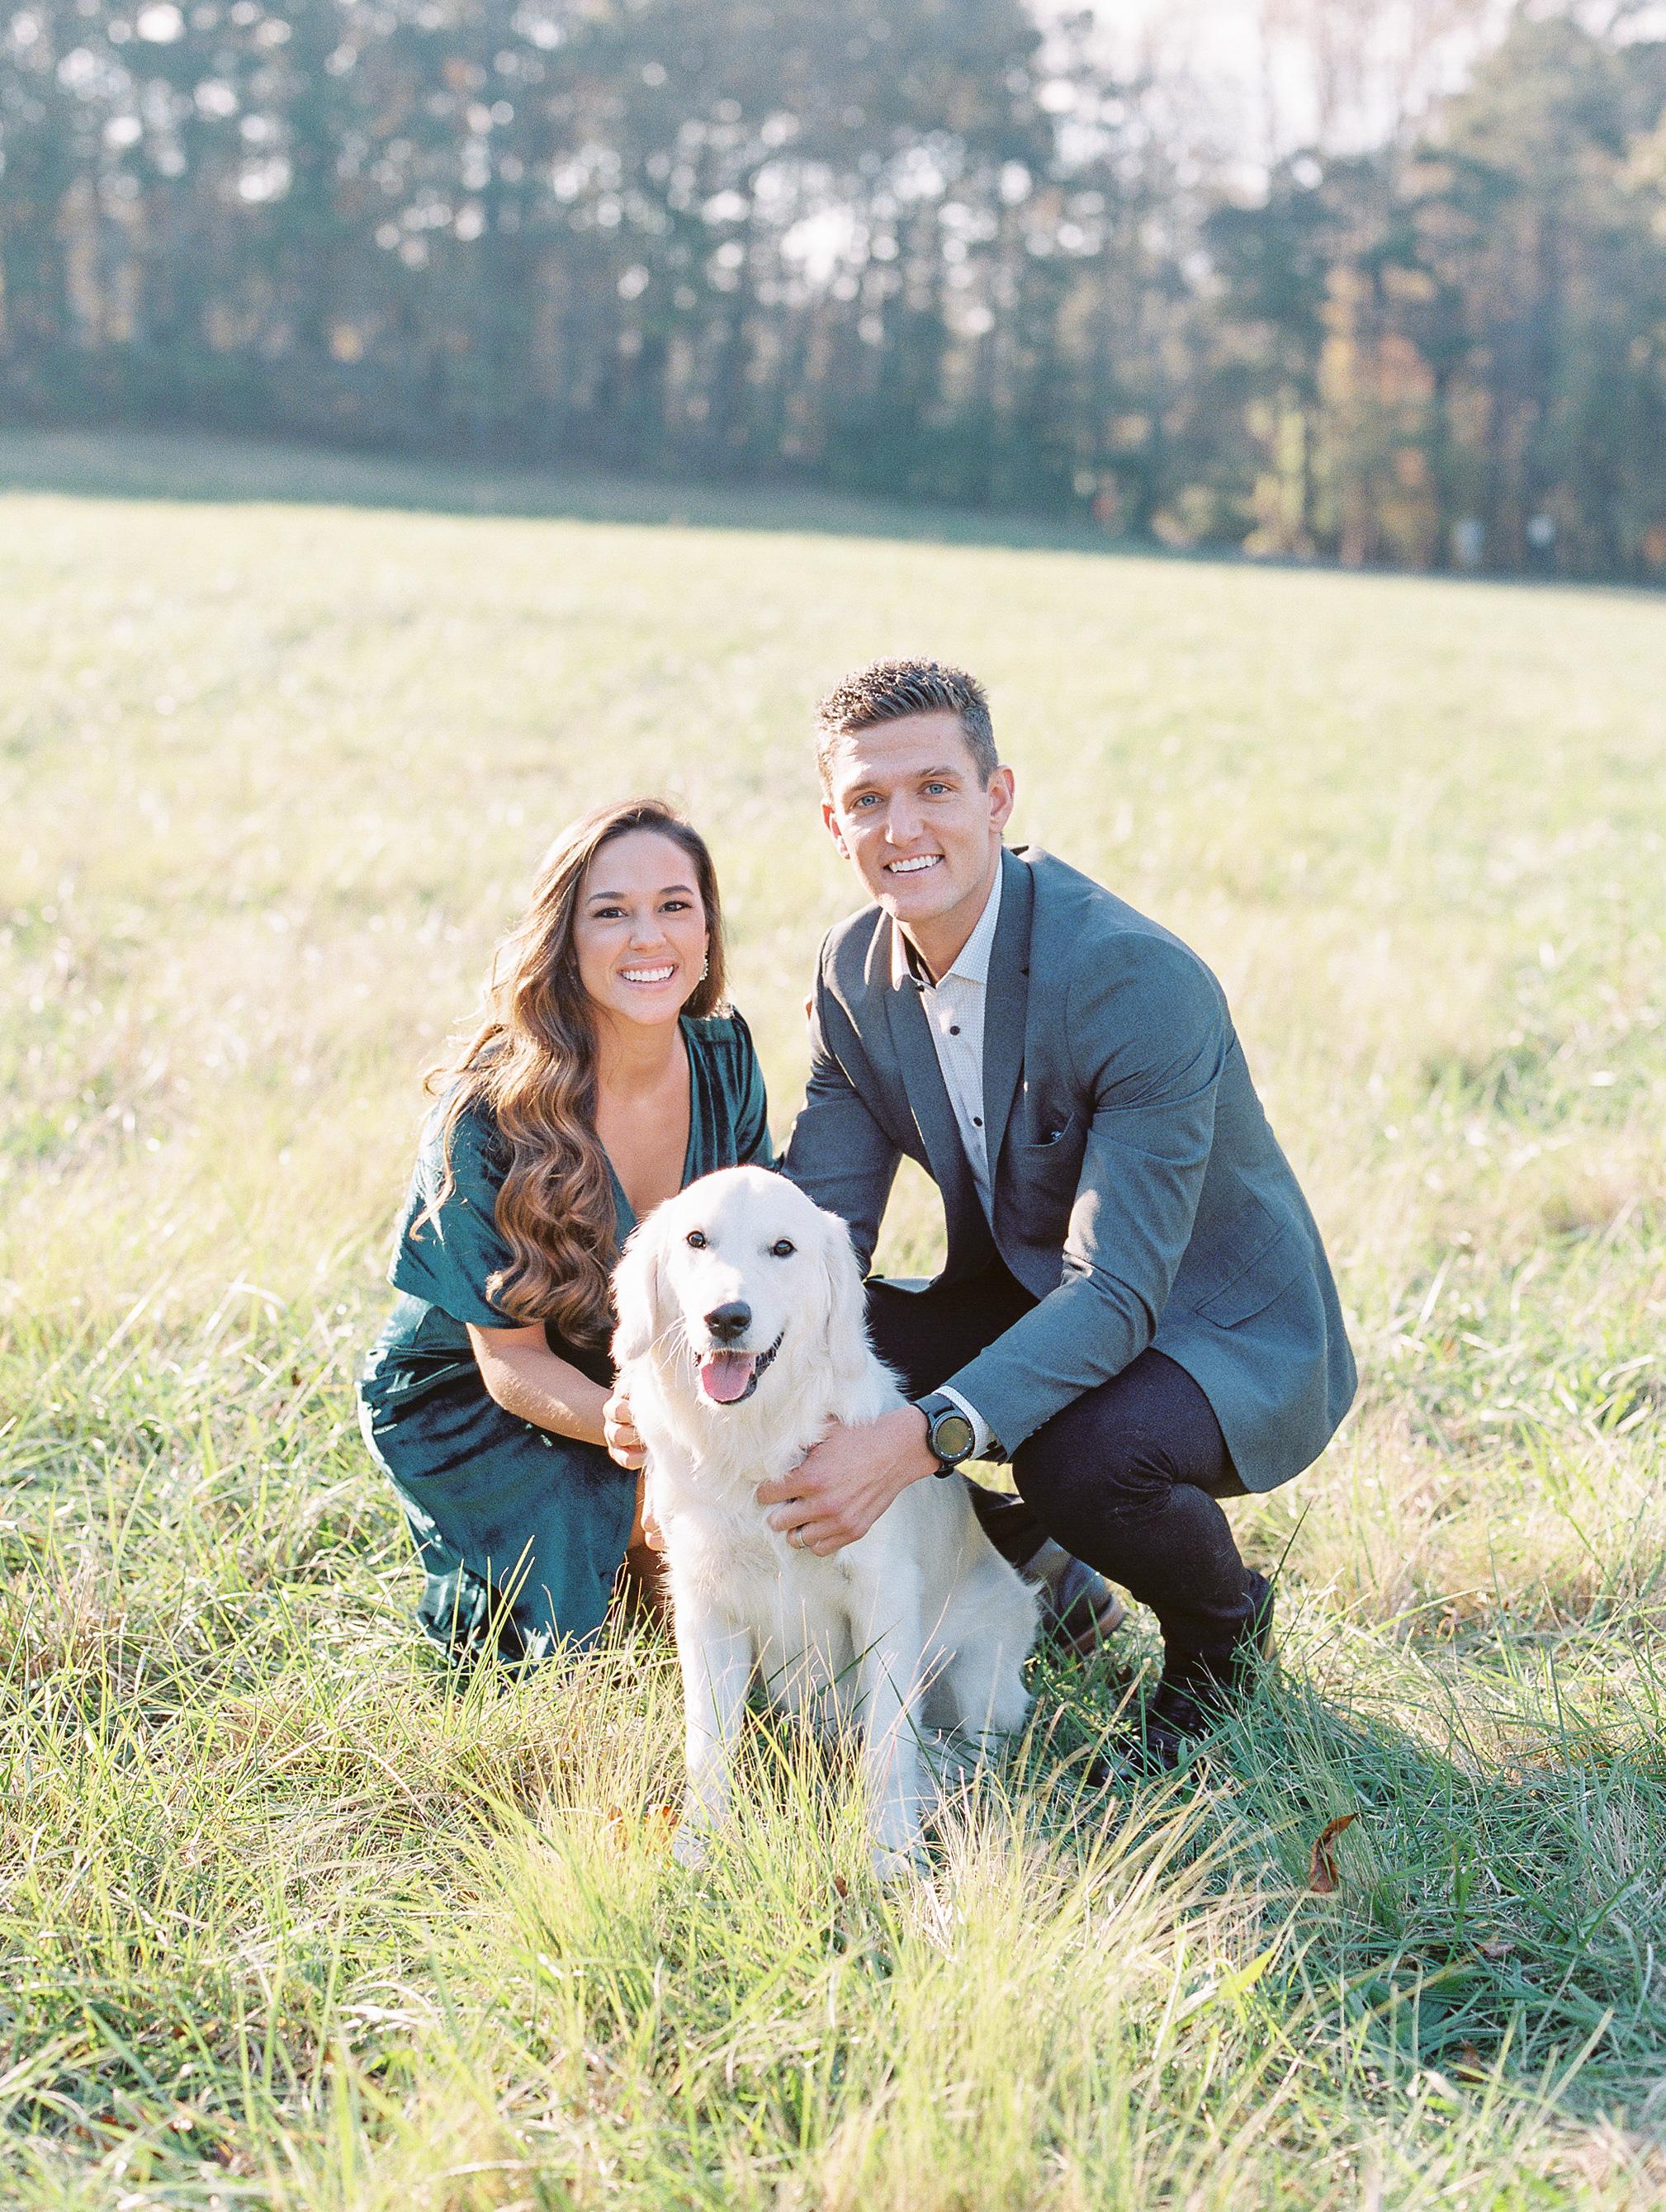 romantic-outdoor-anniversary-photos-hannah-forsberg-atlanta-wedding-photographer182.JPG